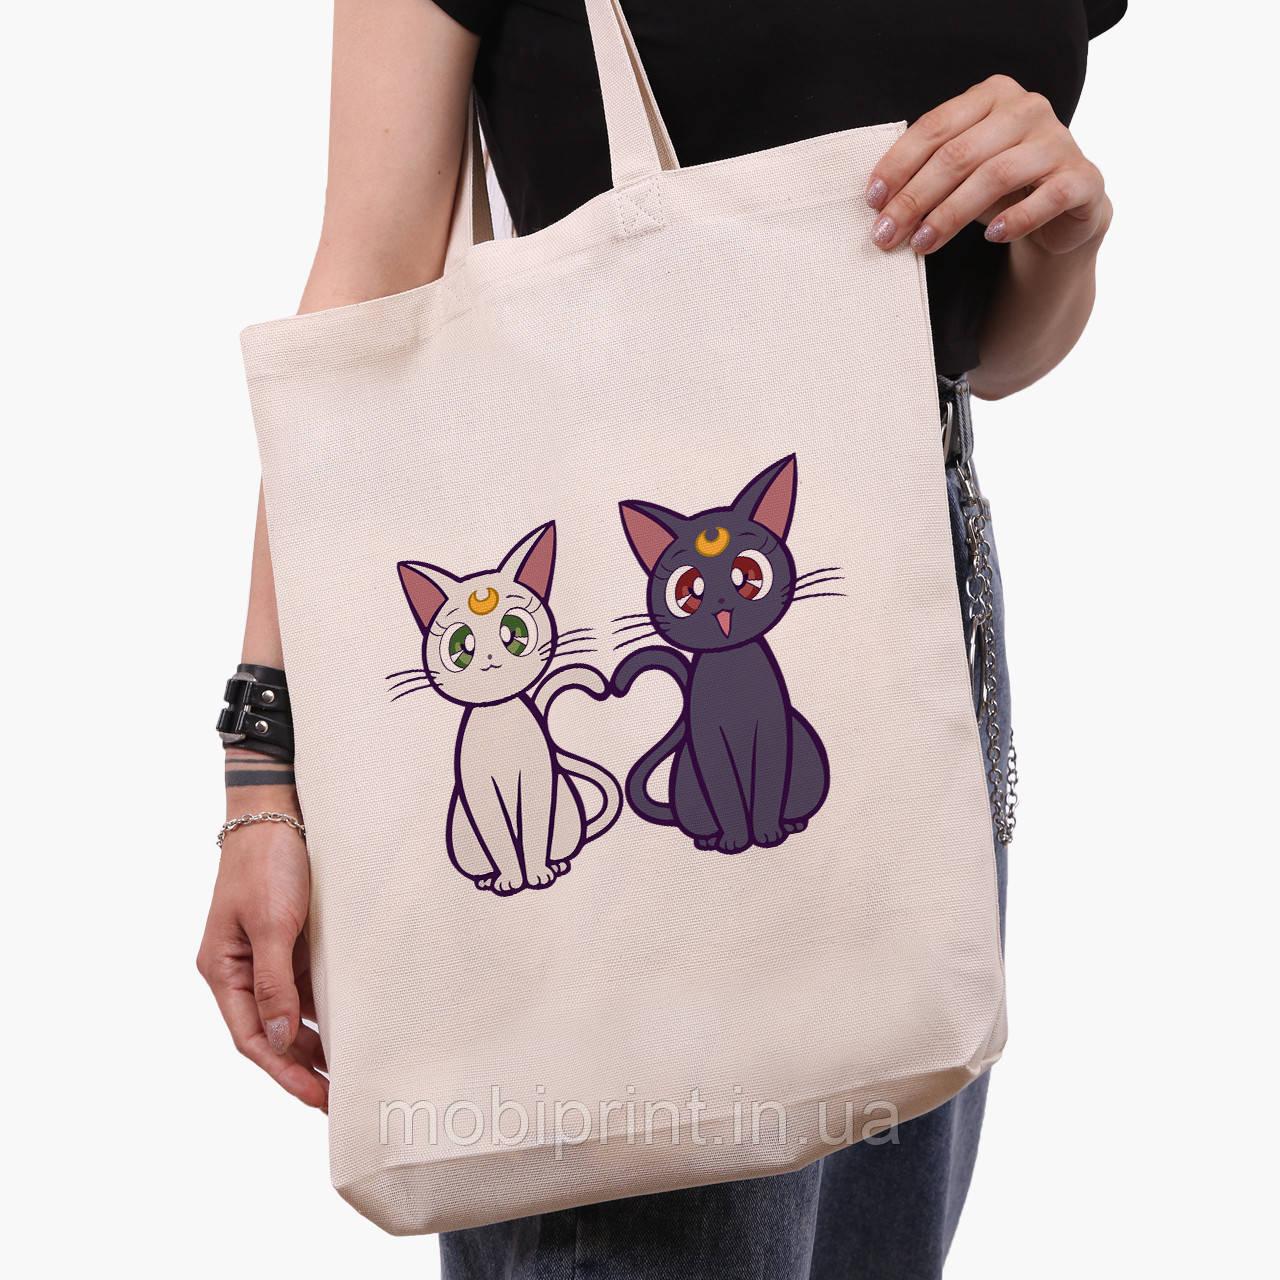 Эко сумка шоппер белая Луна Кошки Сейлор Мун (anime Sailor Moon Cats) (9227-2849-1)  41*39*8 см